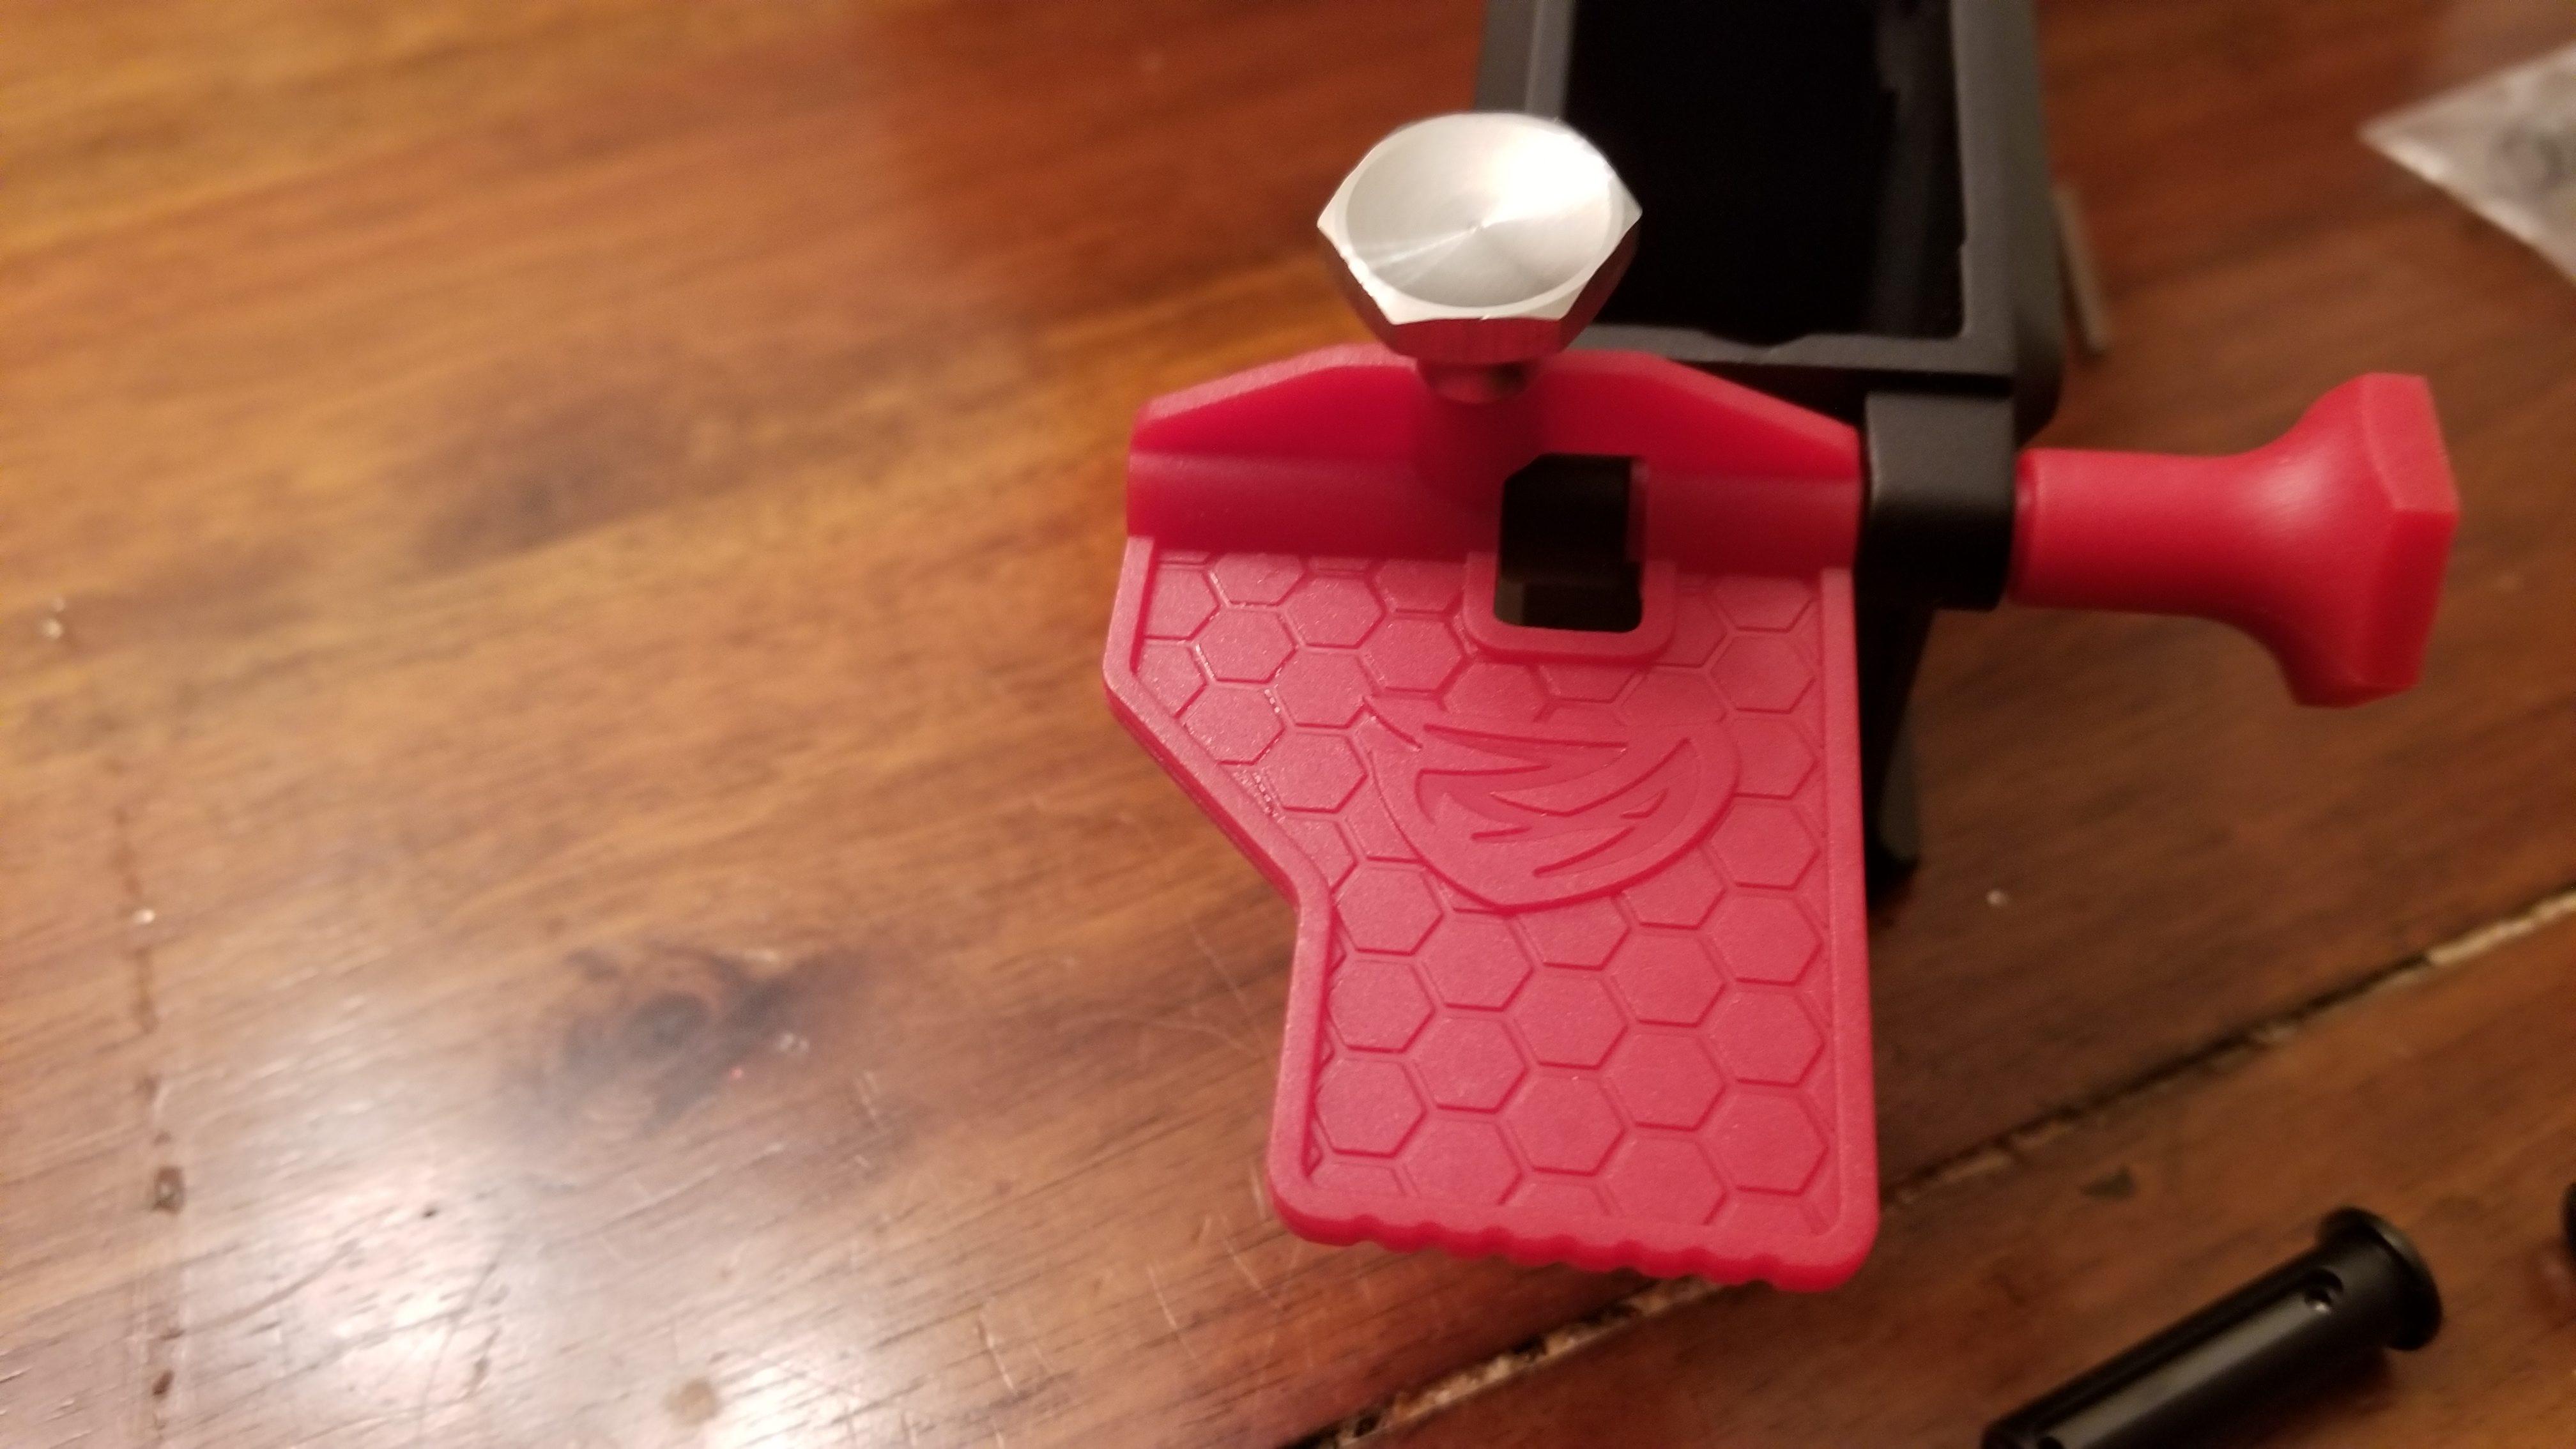 Real Avid Pivot Pin Tool Review - The Liberty Report